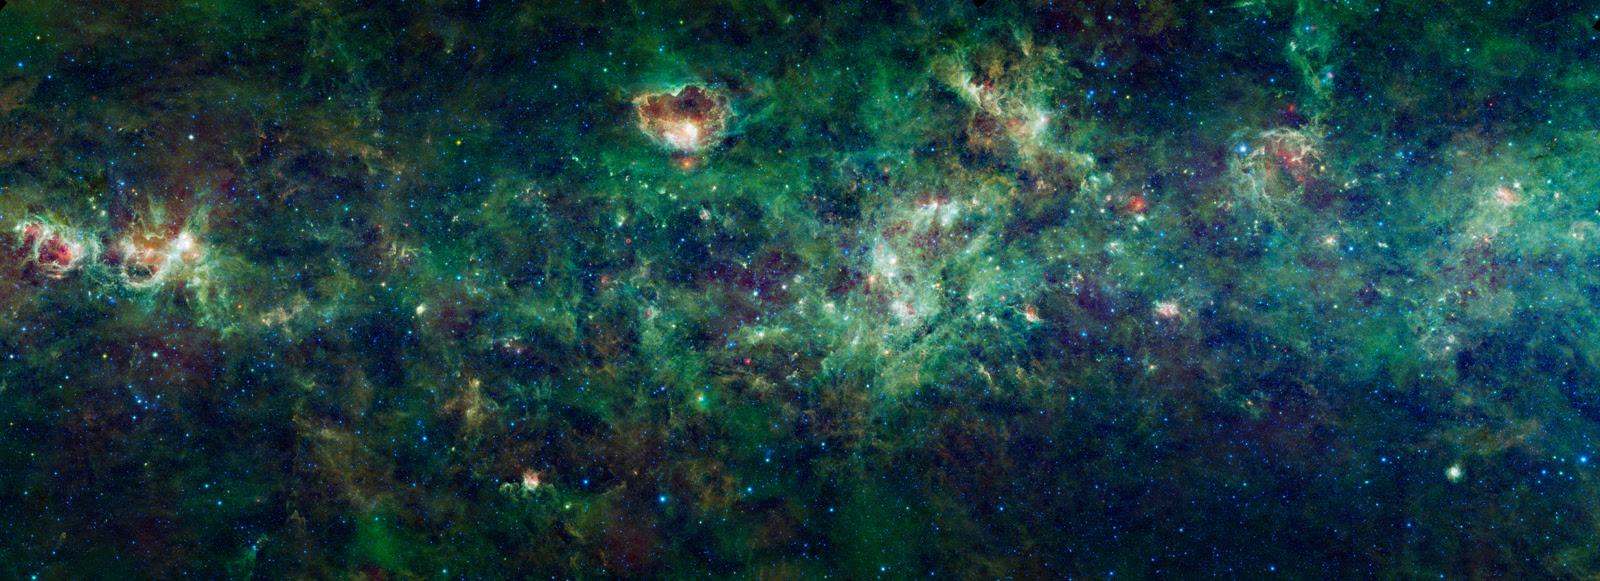 nebulae, via lactea, infrarrojos wise, galaxia